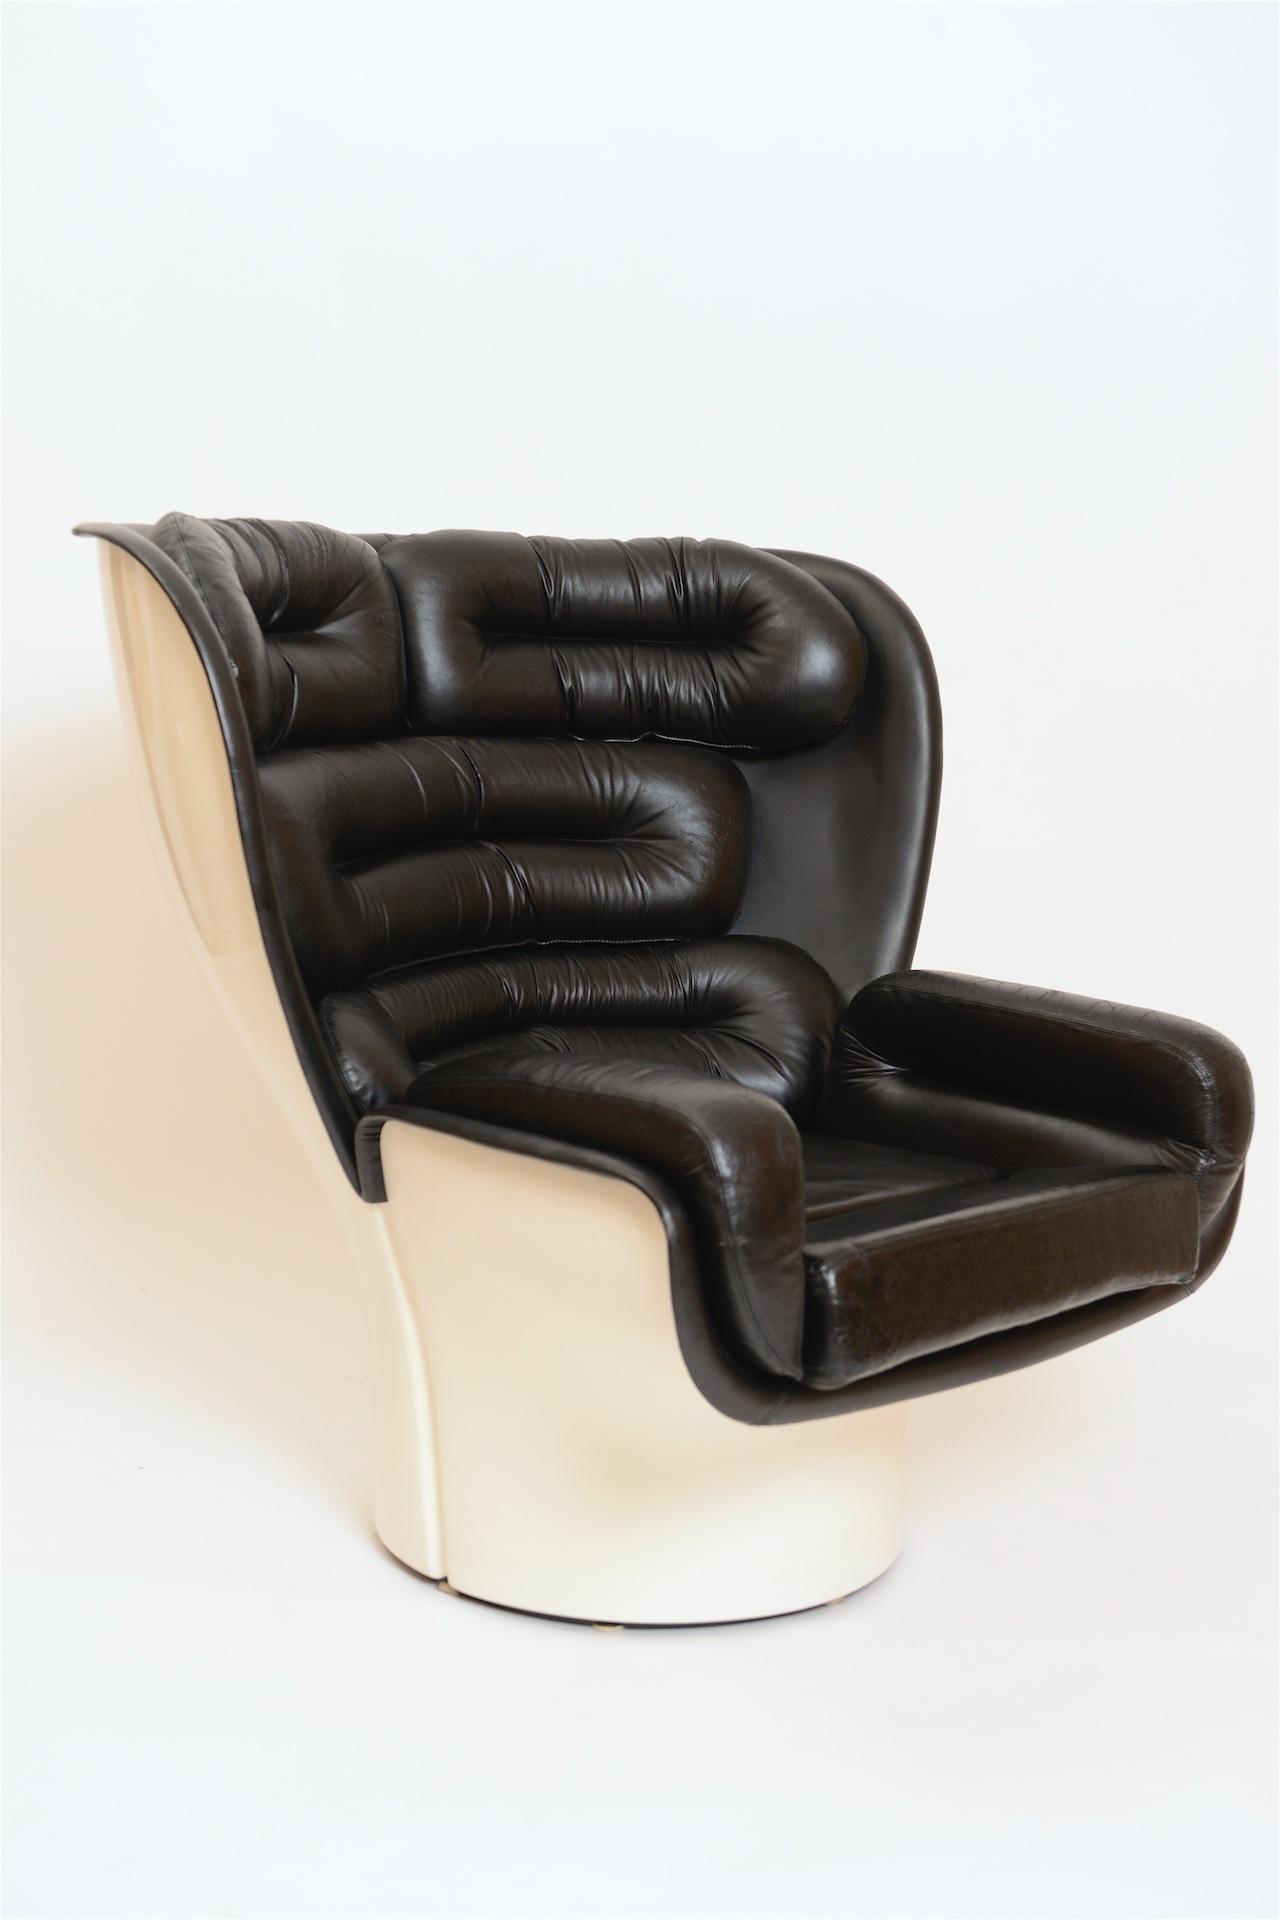 Black And White Elda Chair By Joe Colombo Italy C 1960 Cupio Gallery